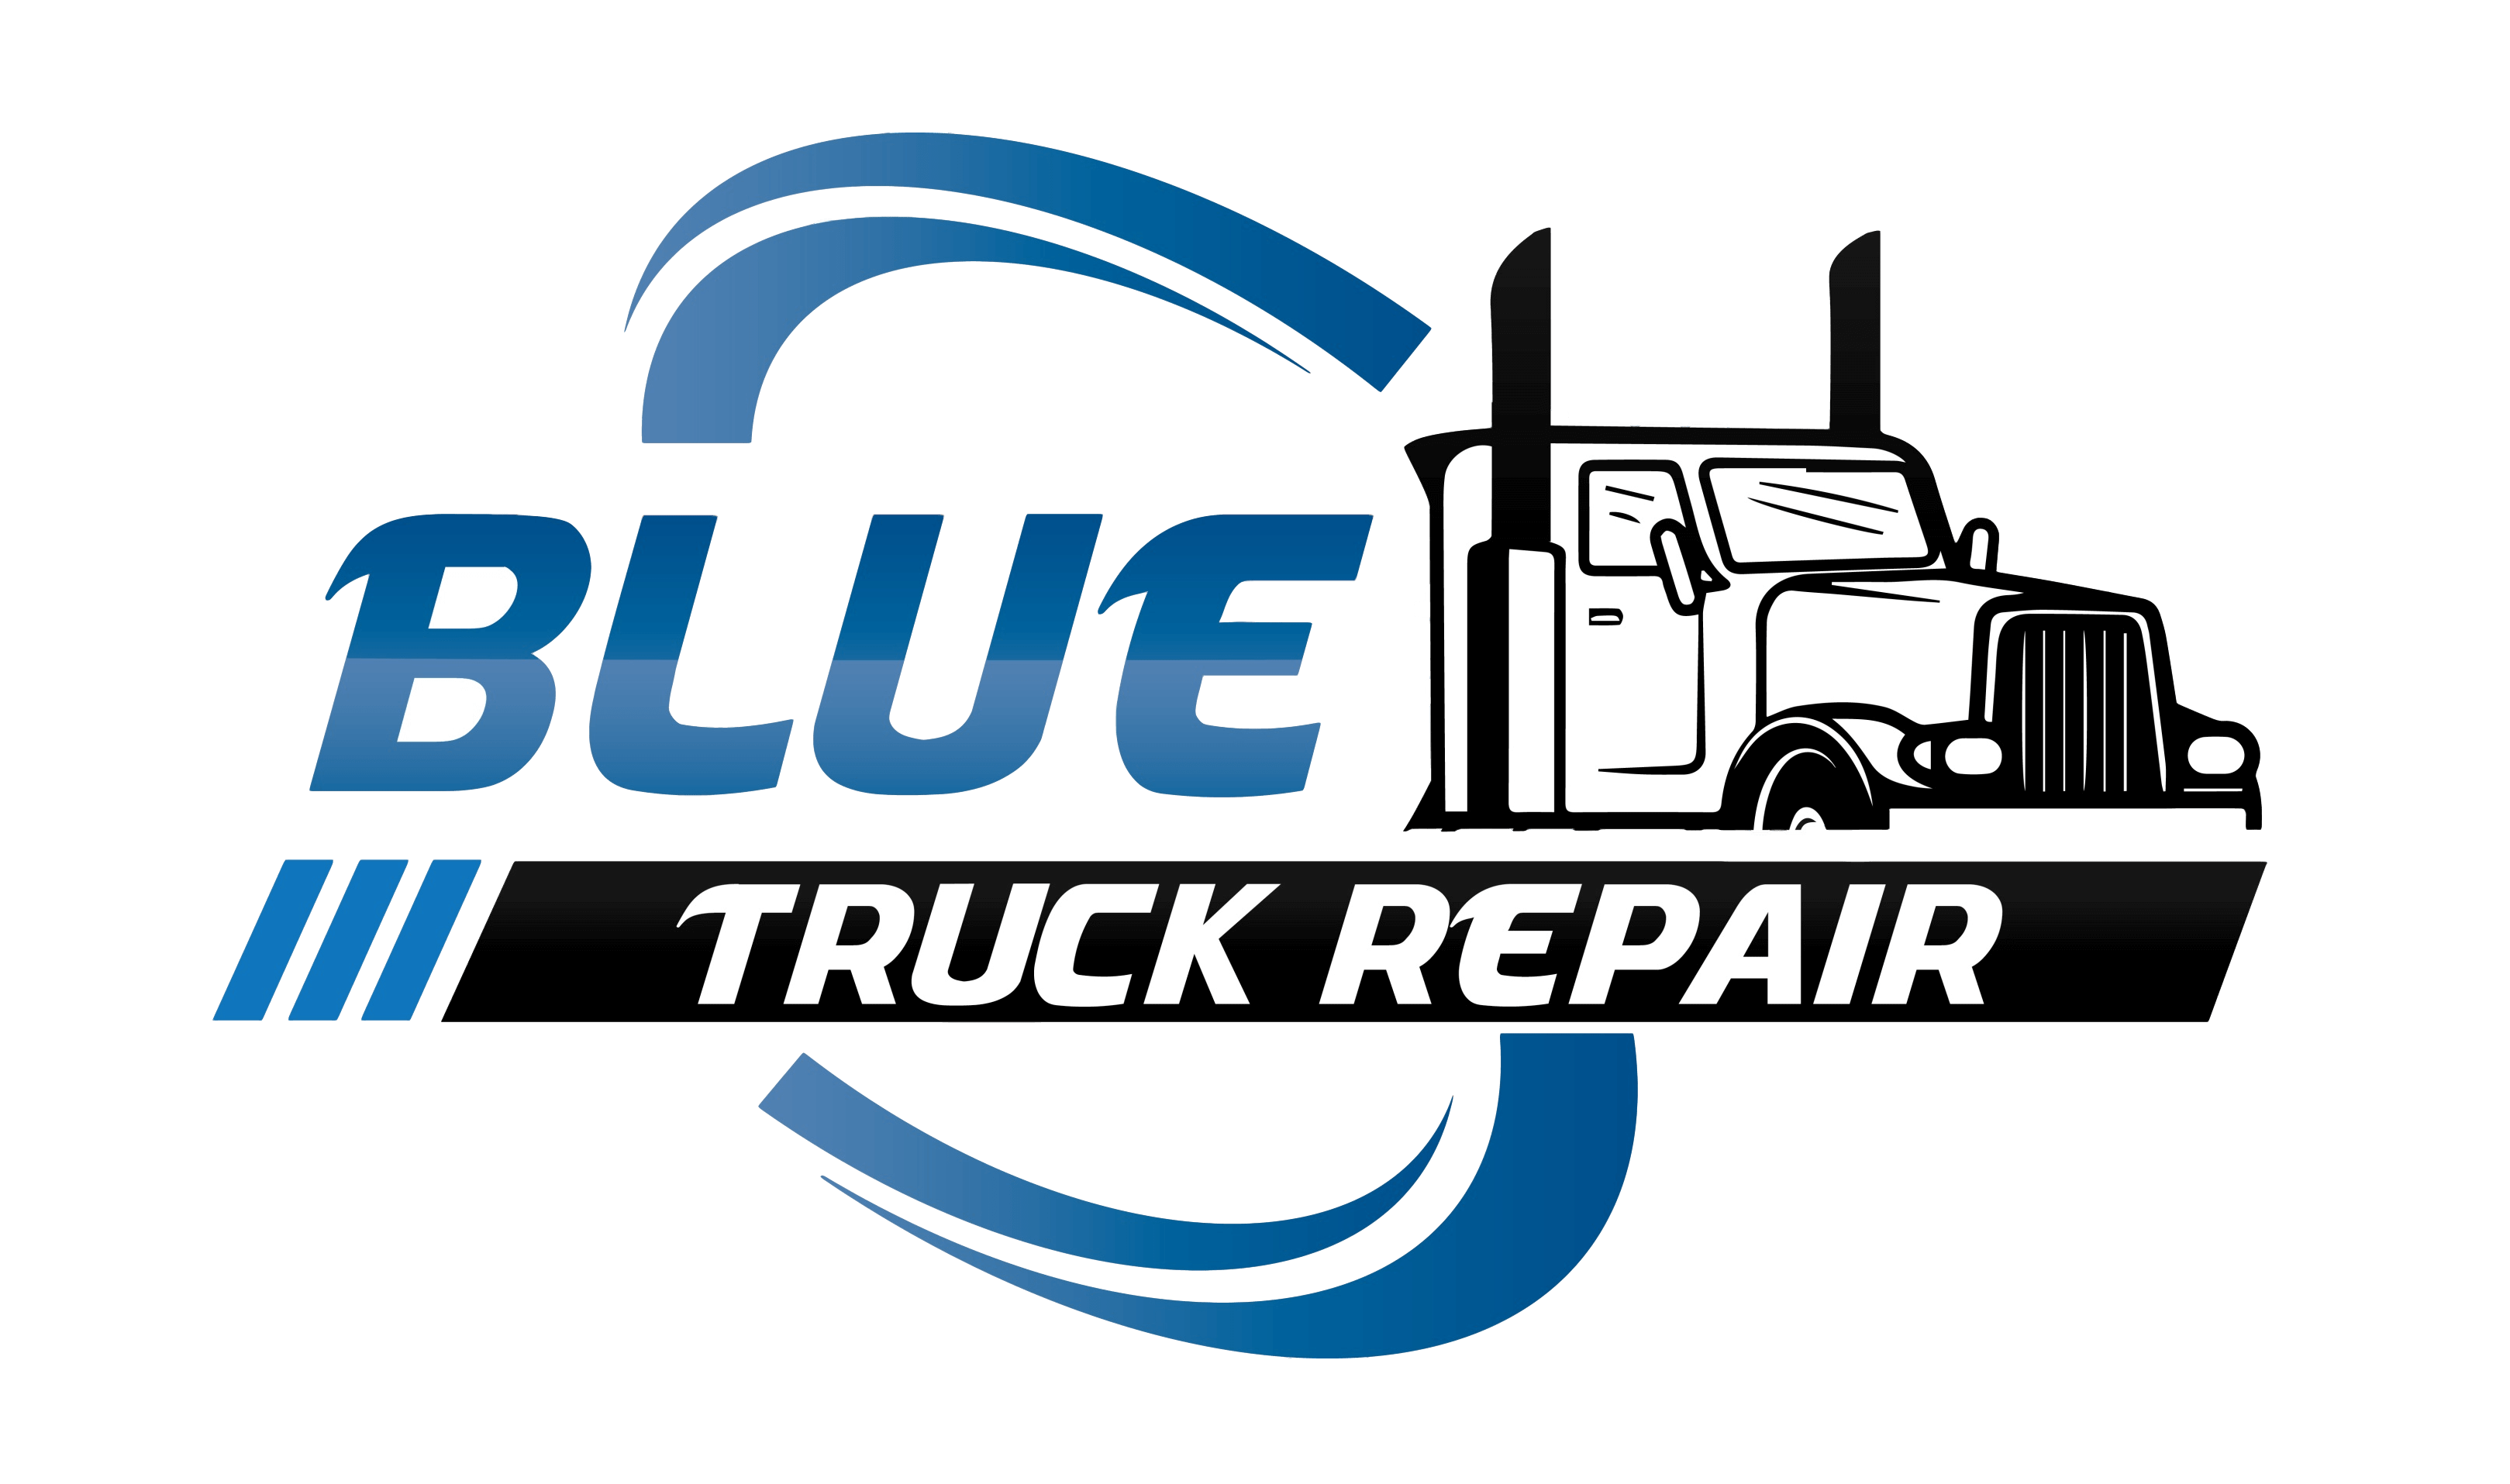 Blue Truck Repair Inc - Mobile Service image 4